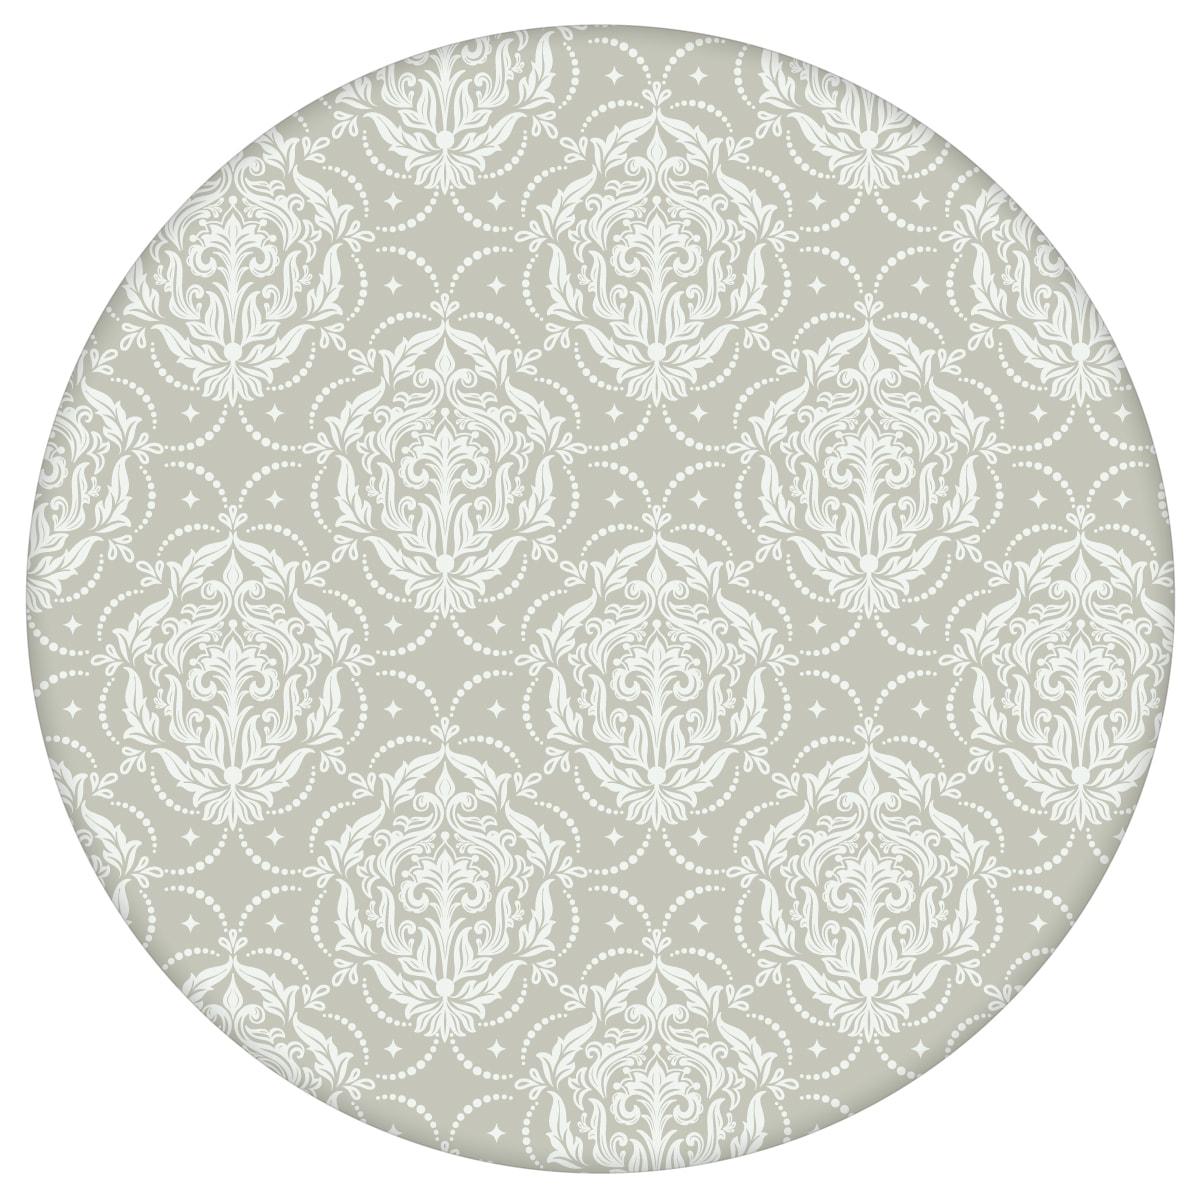 Graue Ornamenttapete My Castle Damast Muster - Design Tapete für Flur, Büro